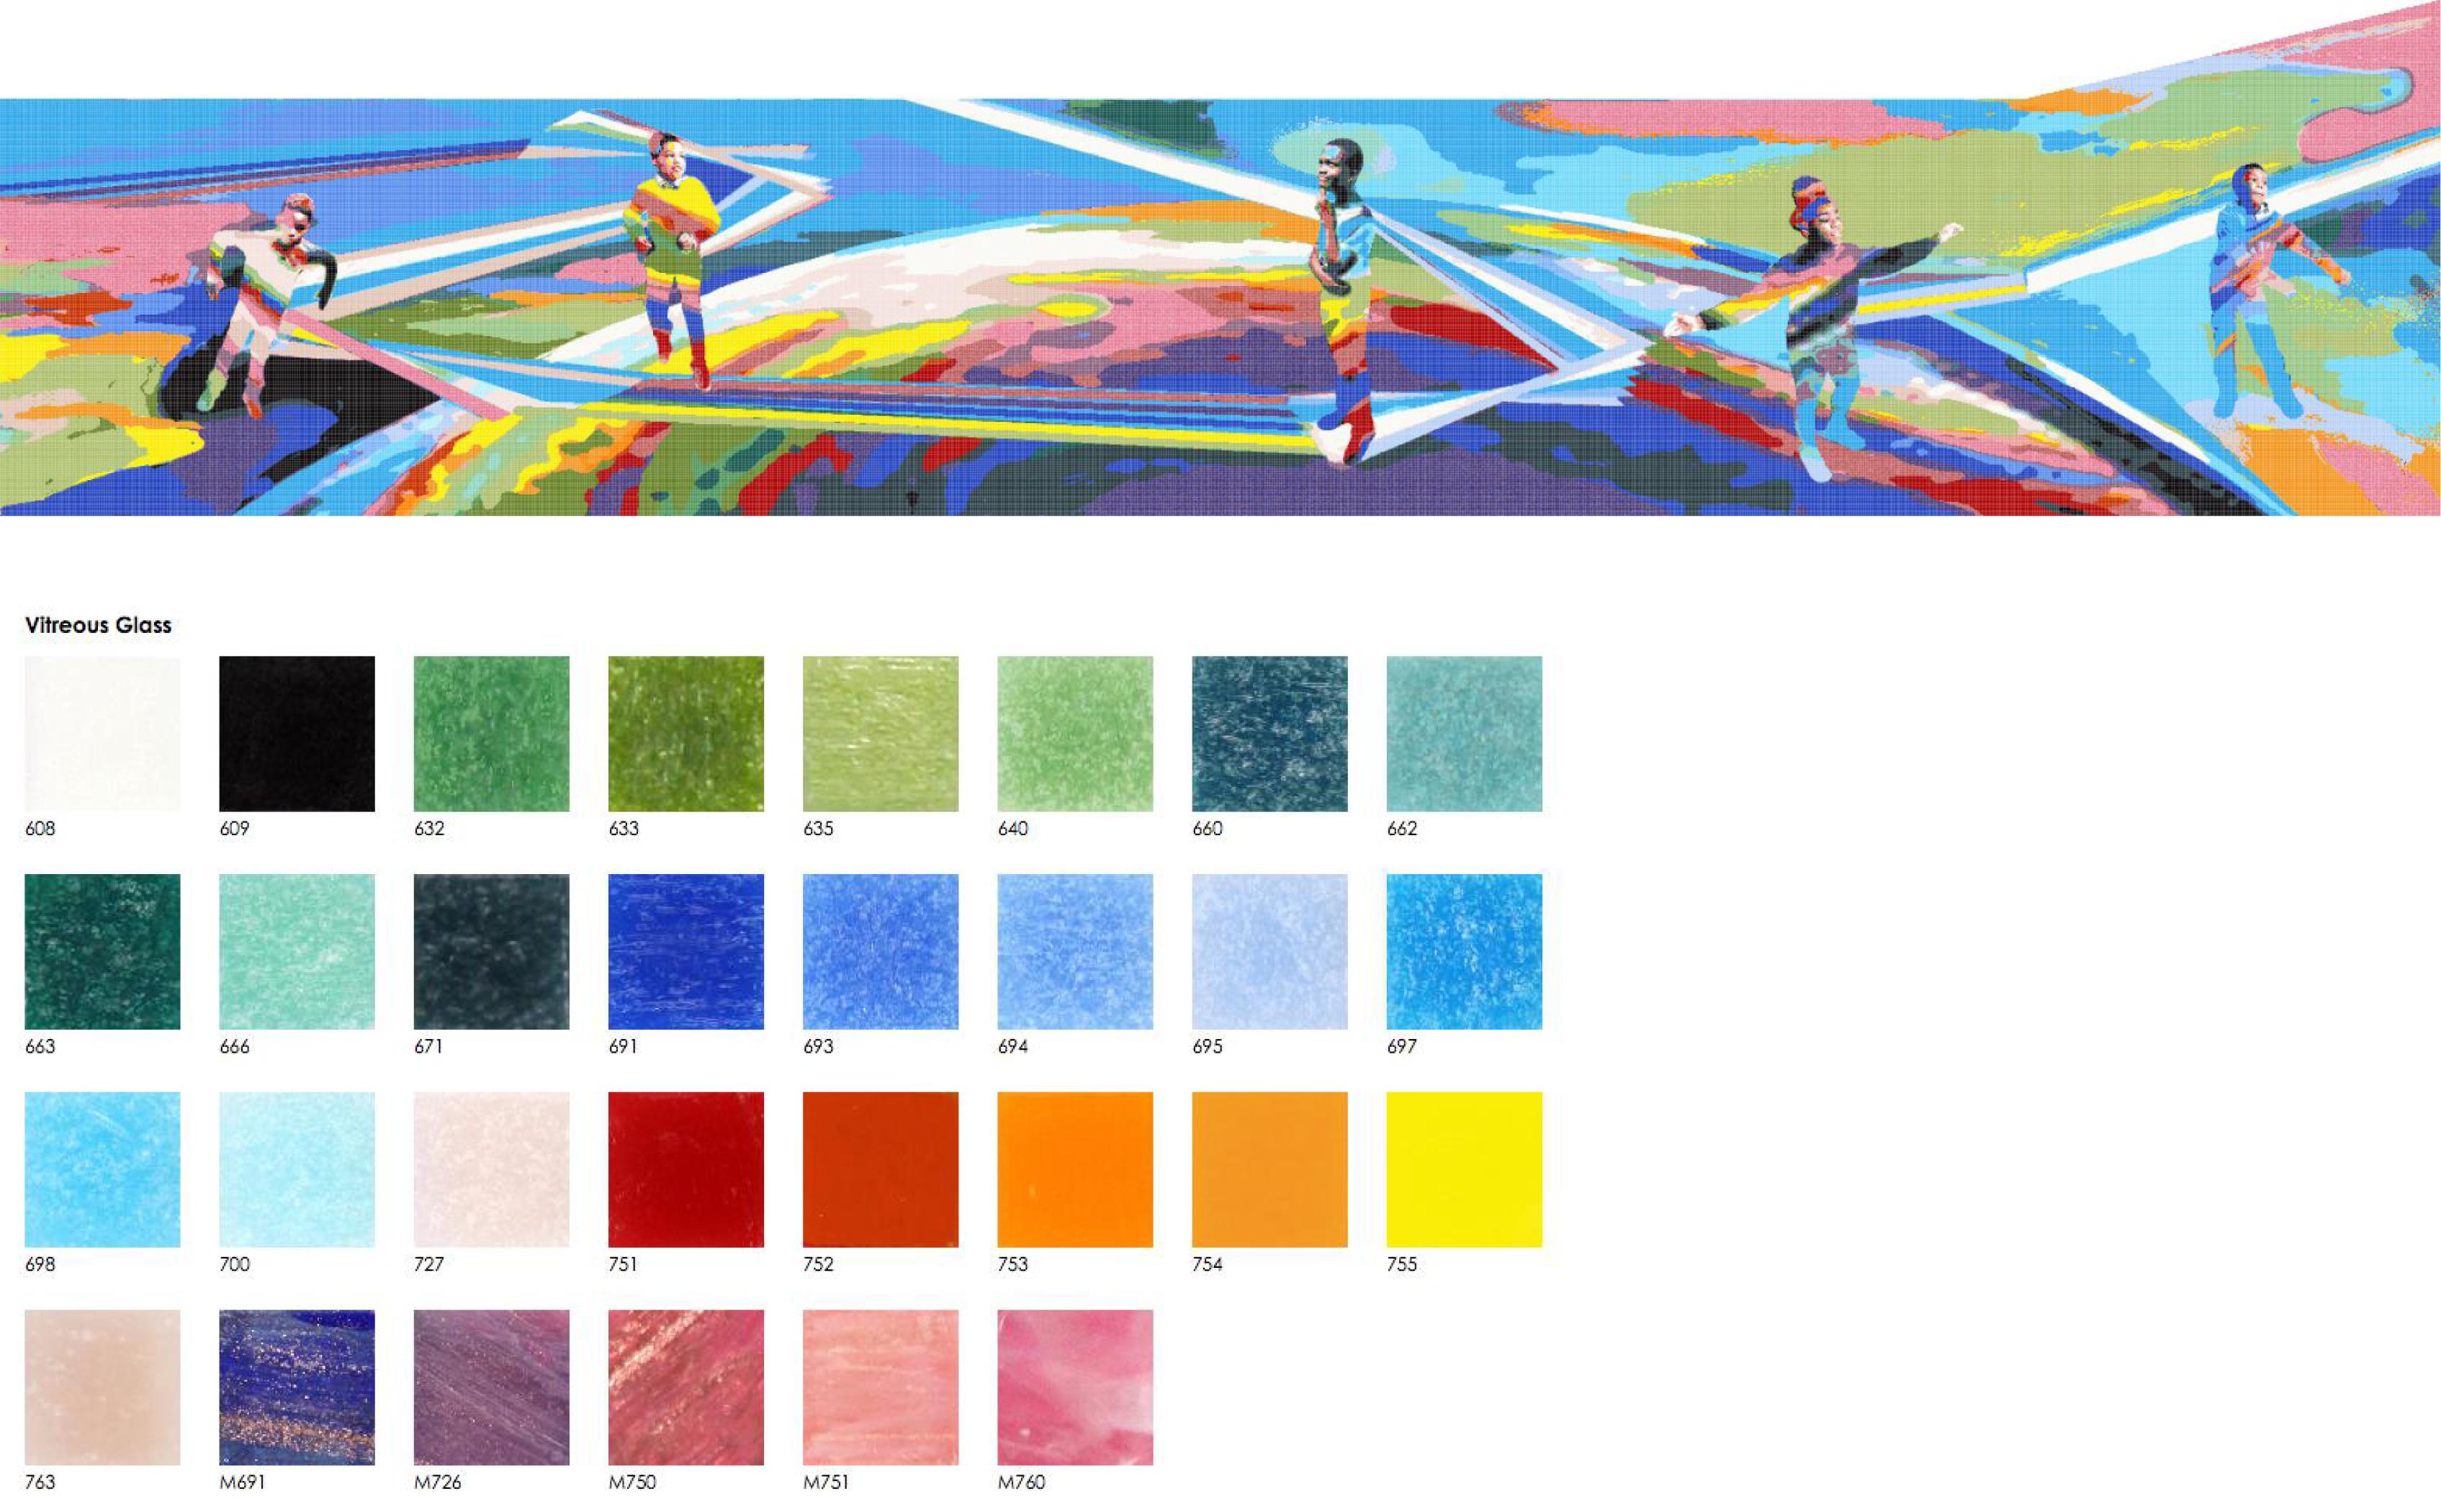 Rainbow Recreation Center Mosaic